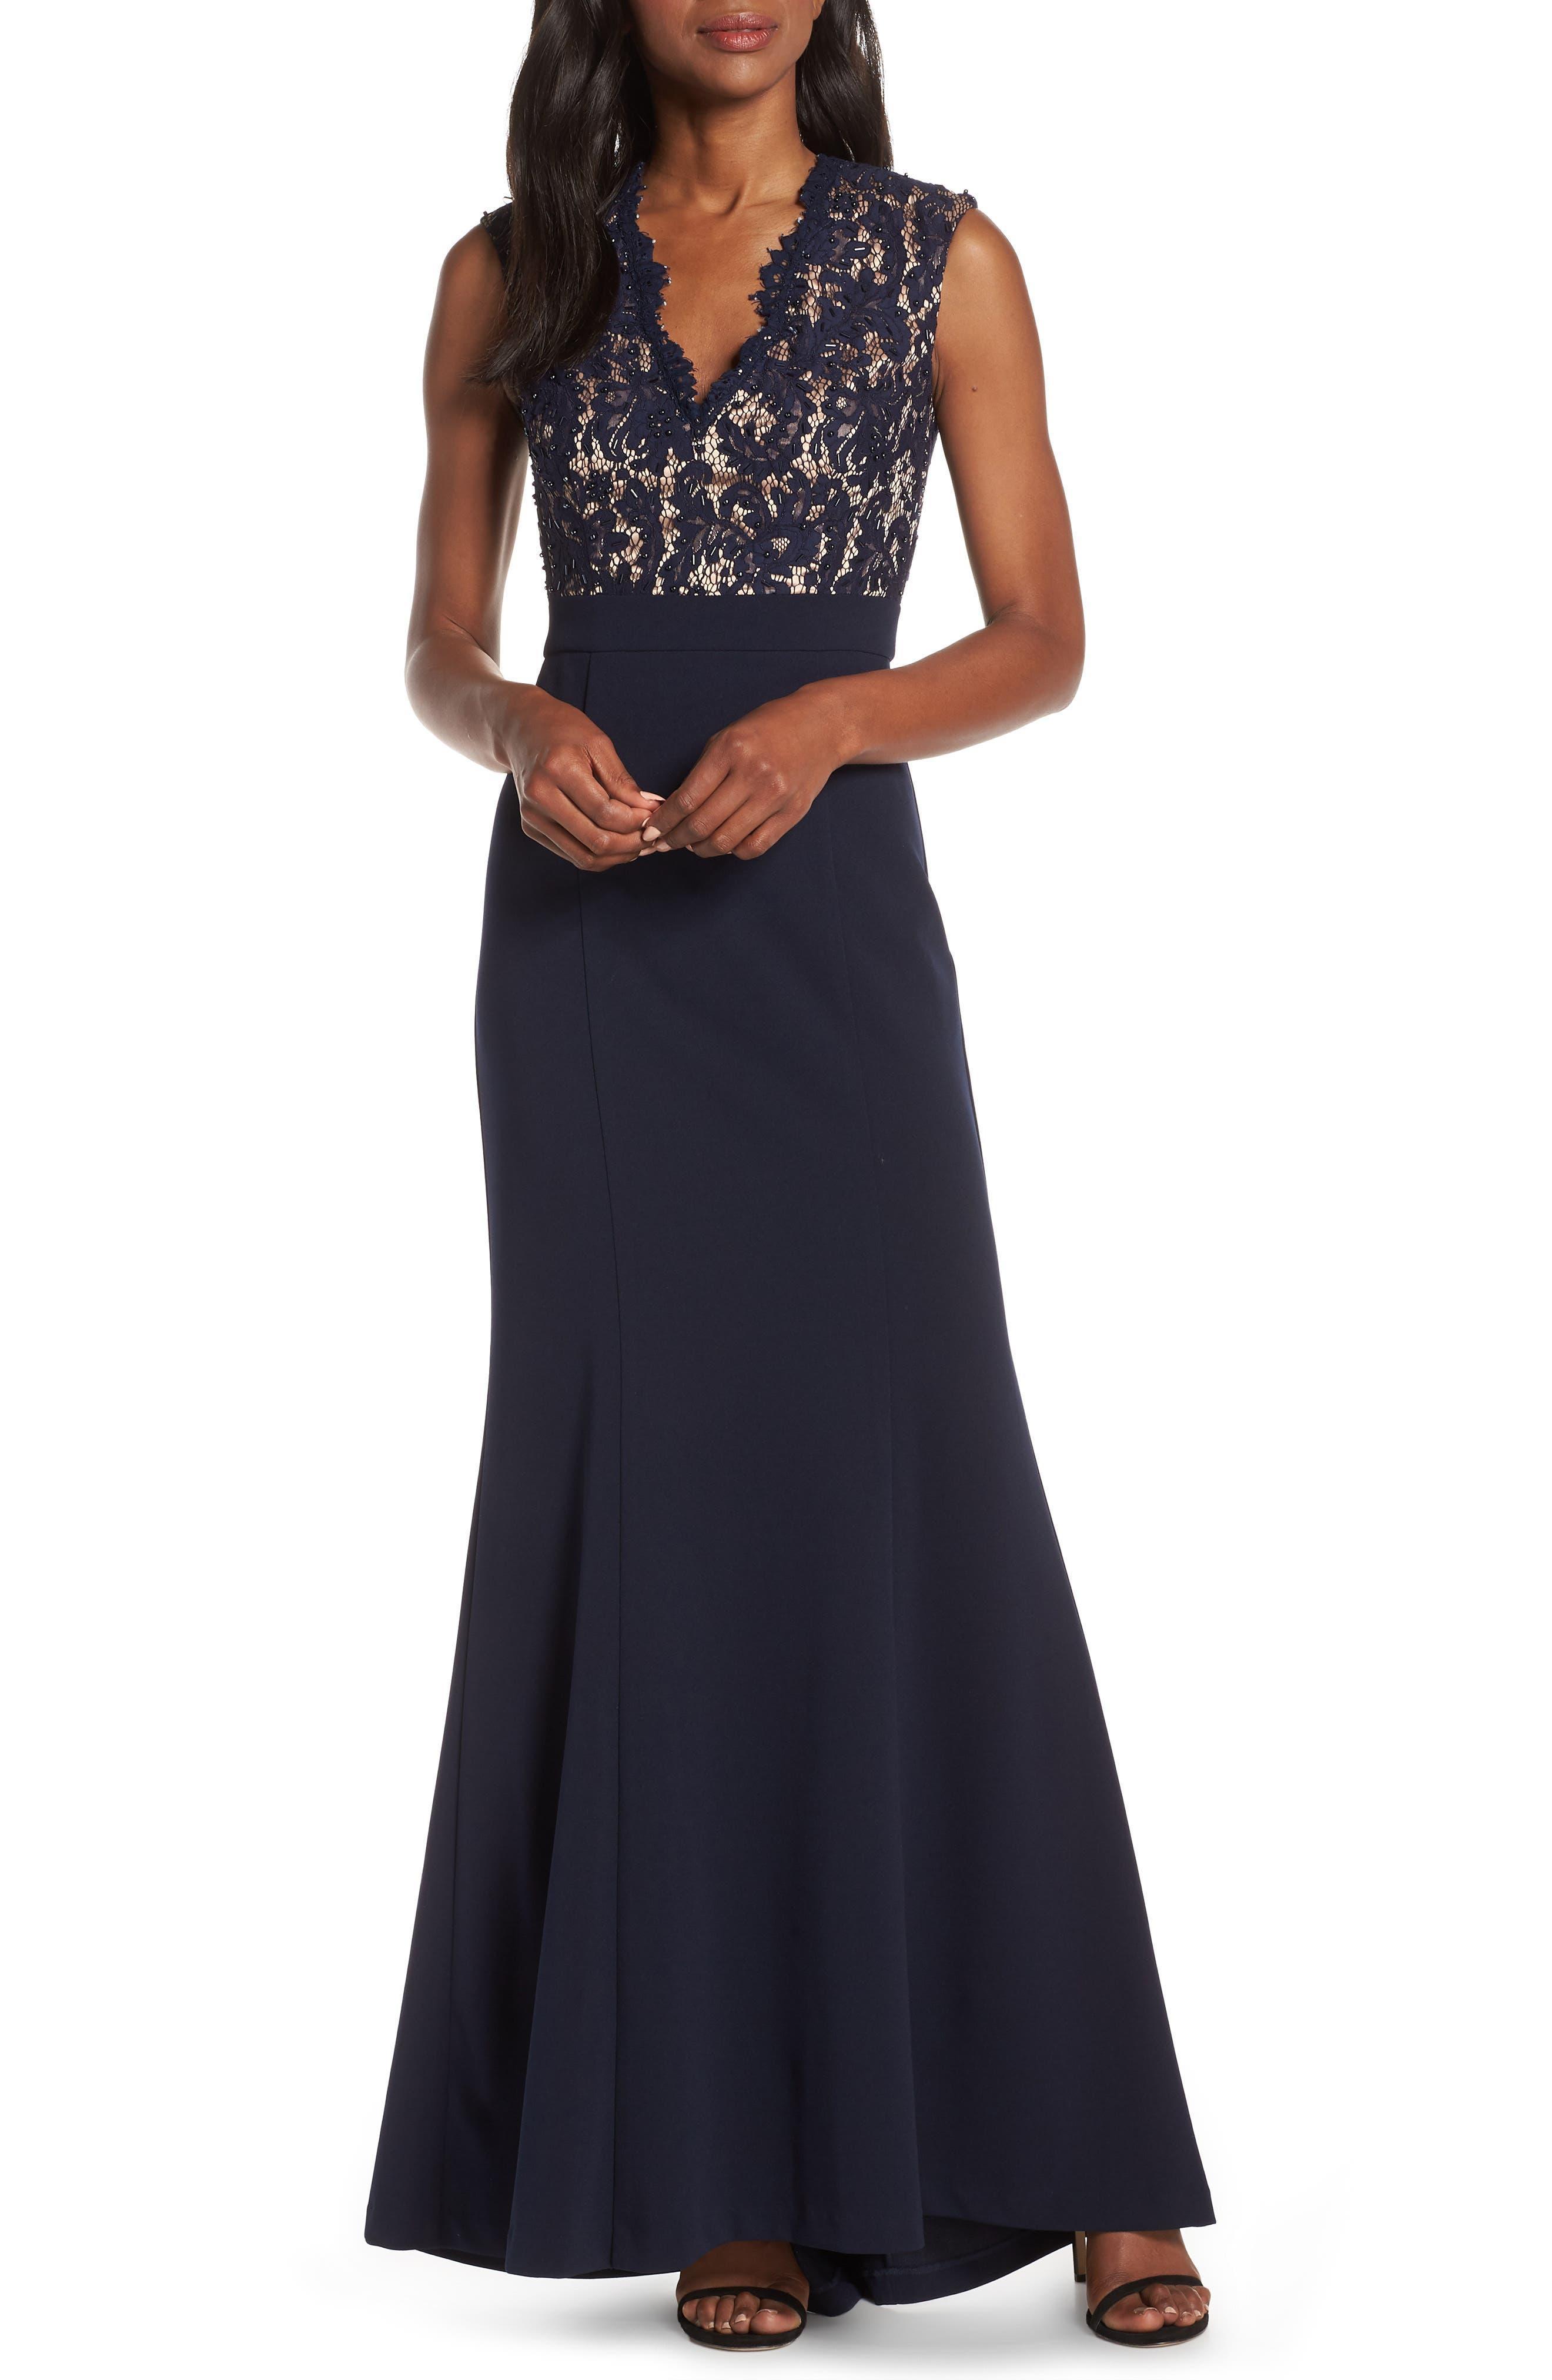 1960s Dresses | 60s Dresses Mod, Mini, Jackie O, Hippie Womens Eliza J Lace Bodice Trumpet Evening Dress Size 4 - Blue $201.00 AT vintagedancer.com